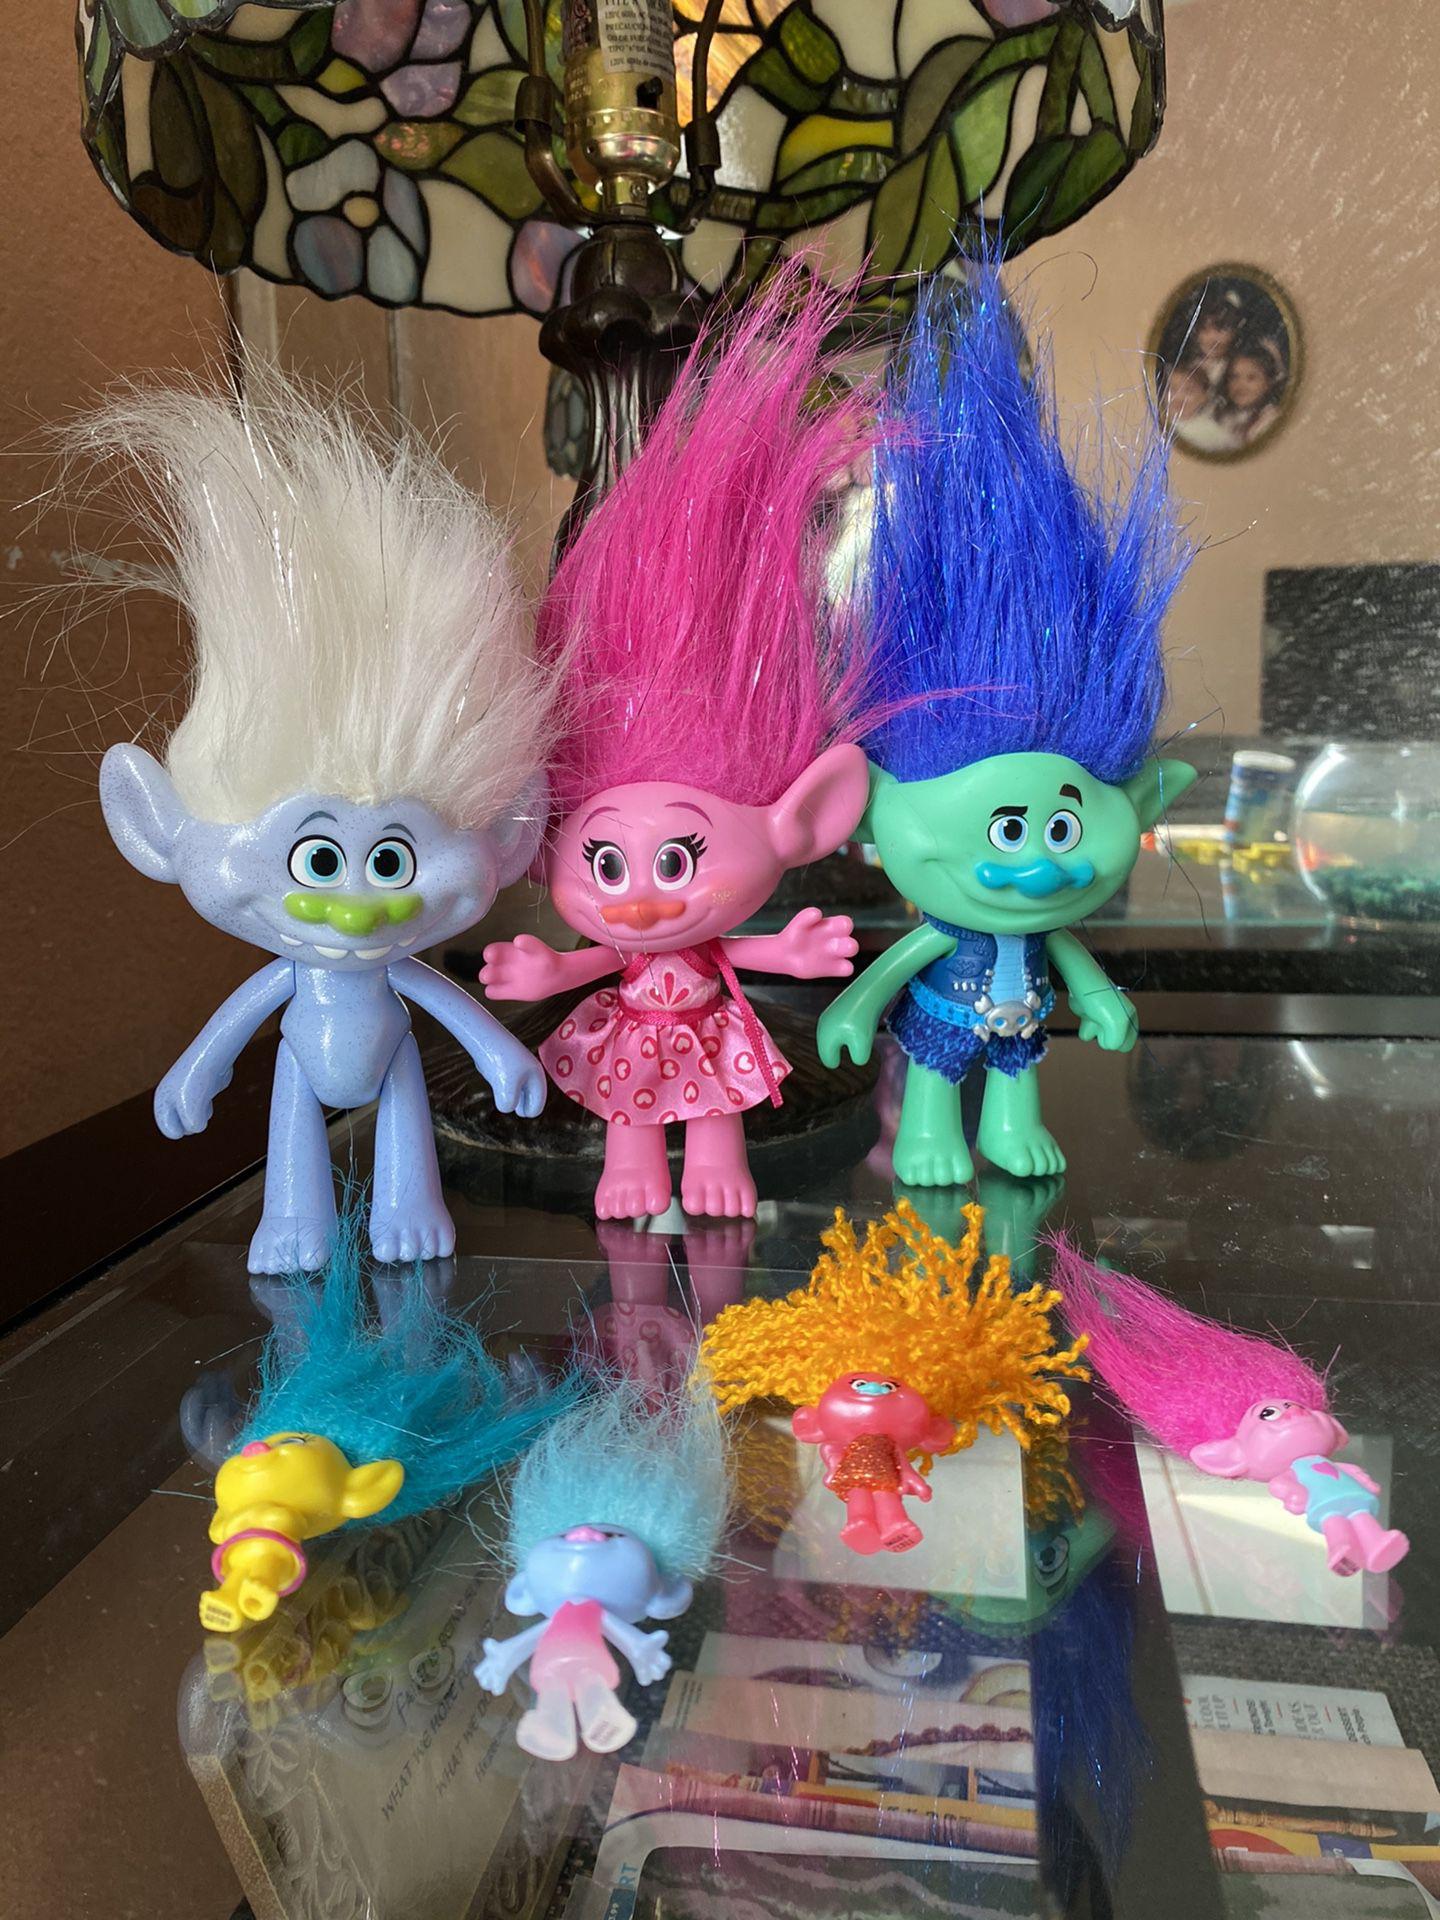 Trolls movie toy lot